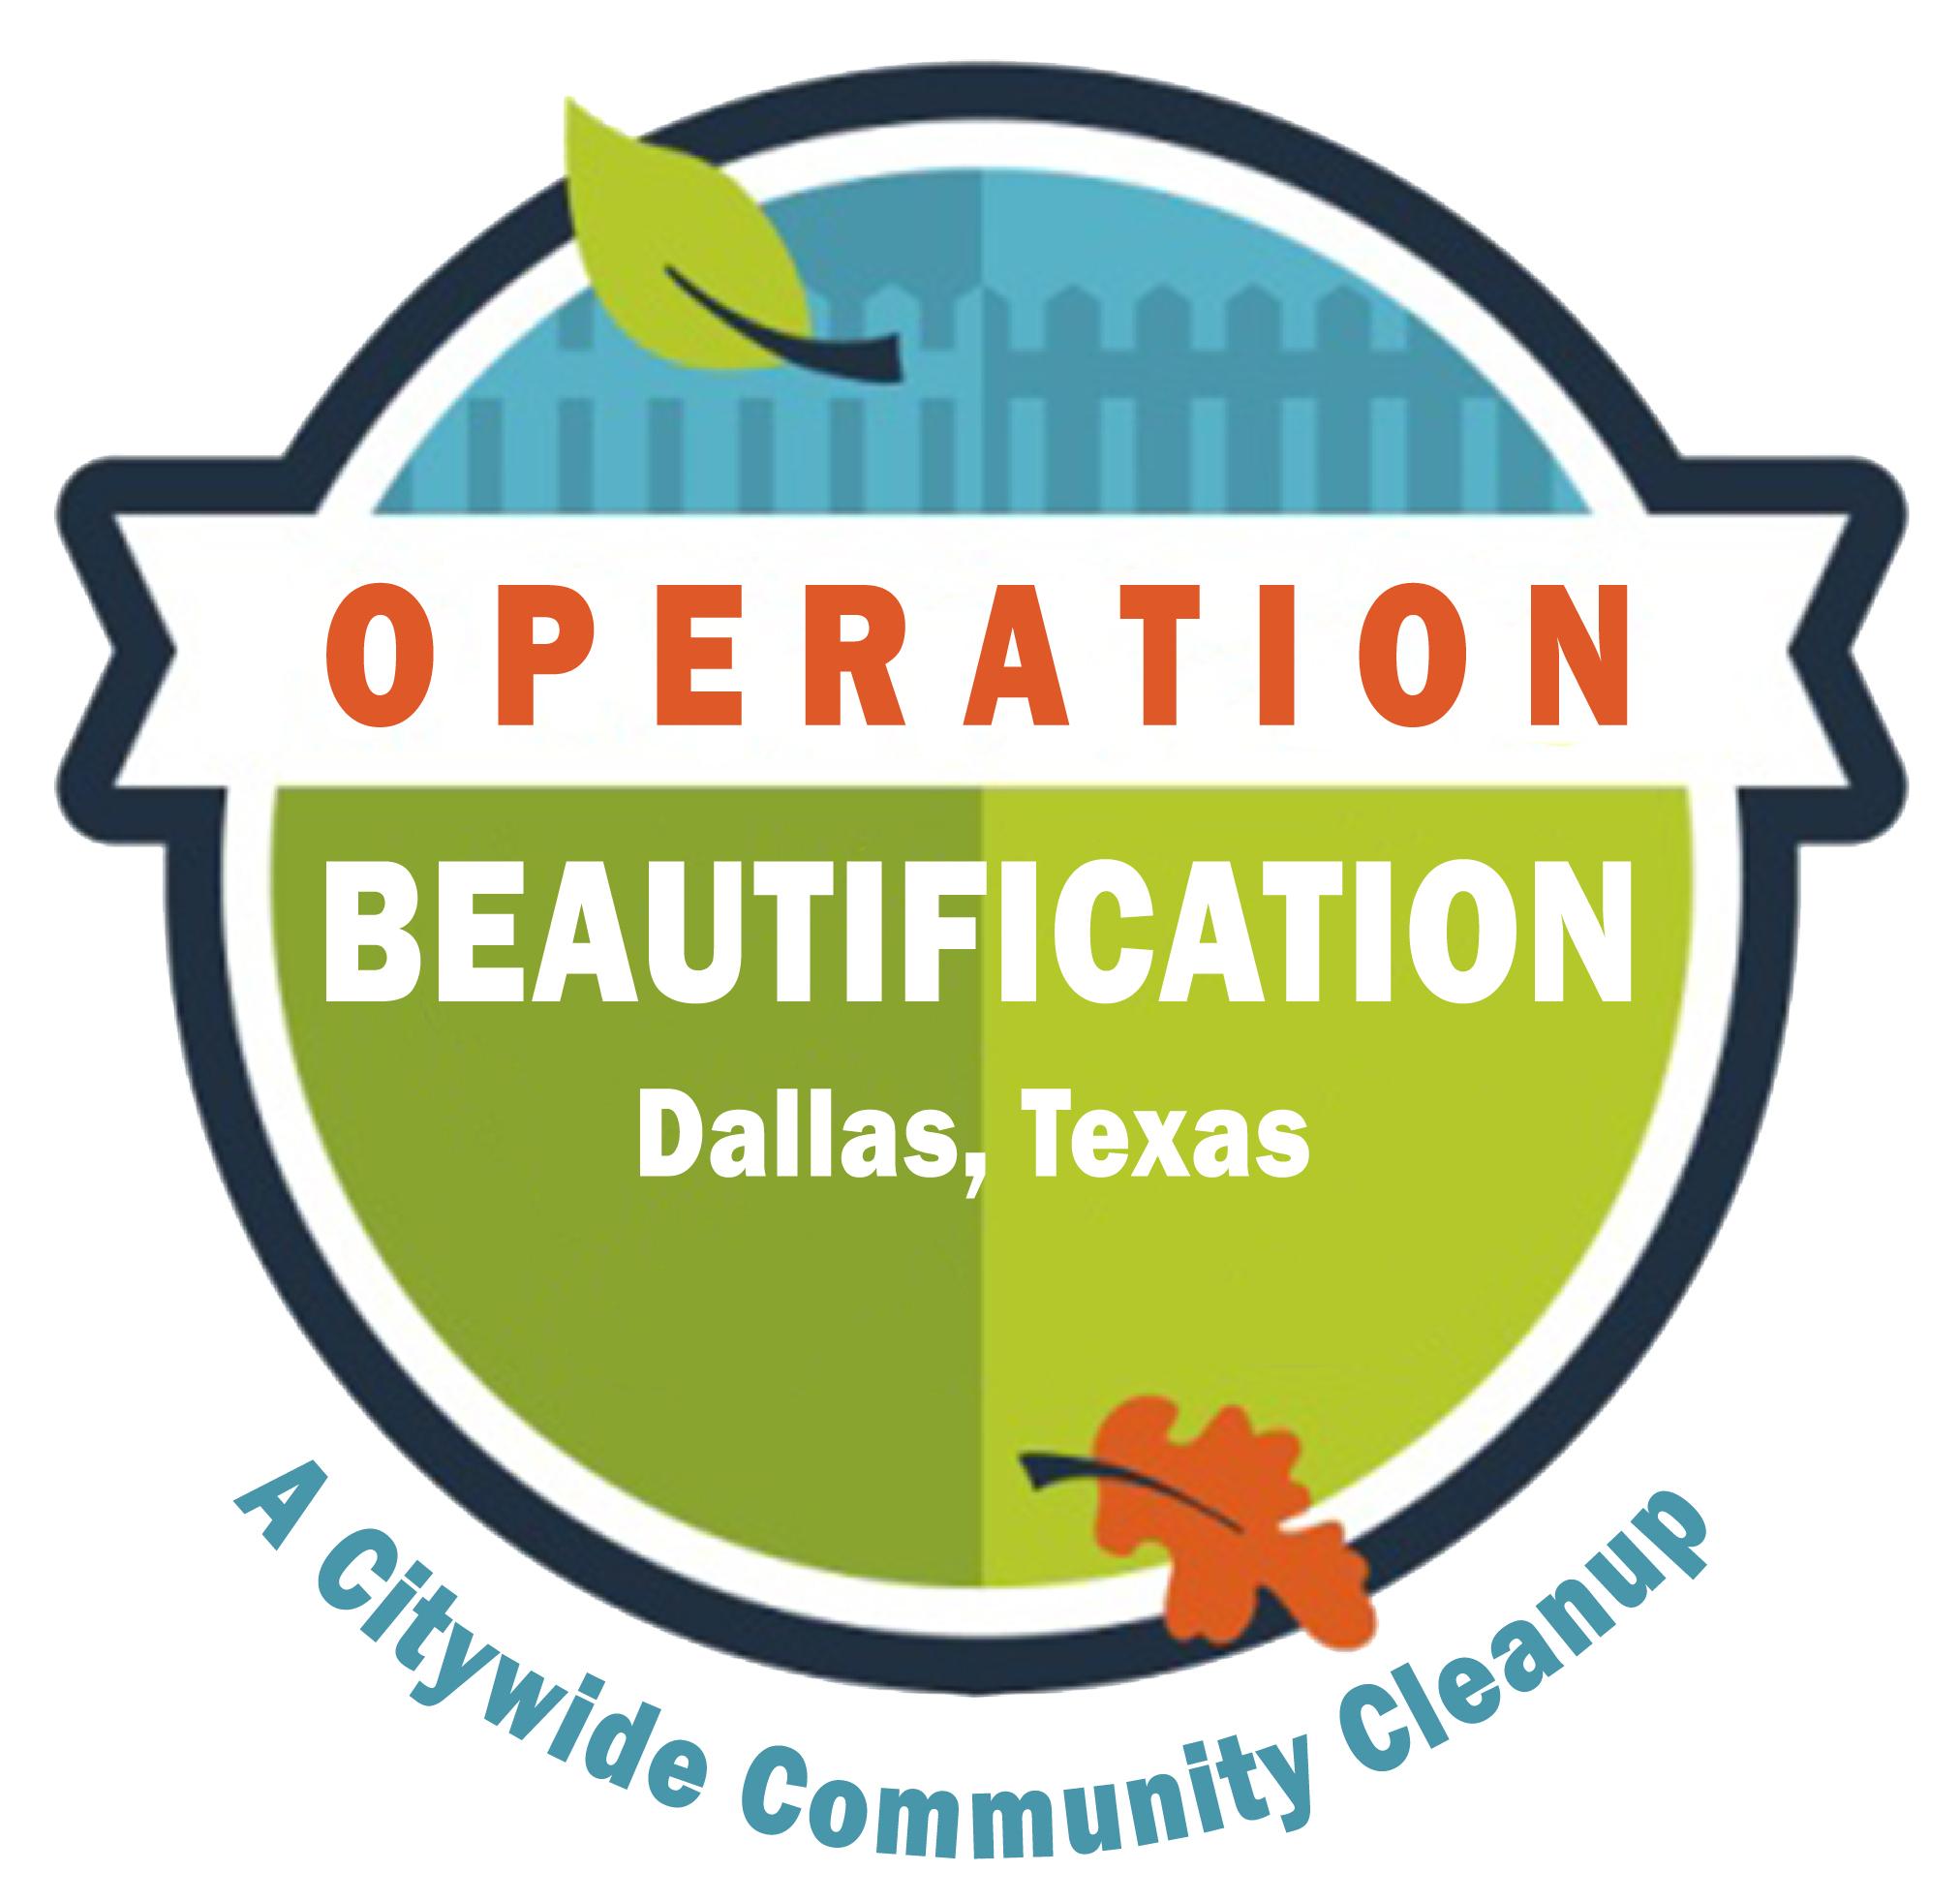 Op Beautification logo 2015.jpg